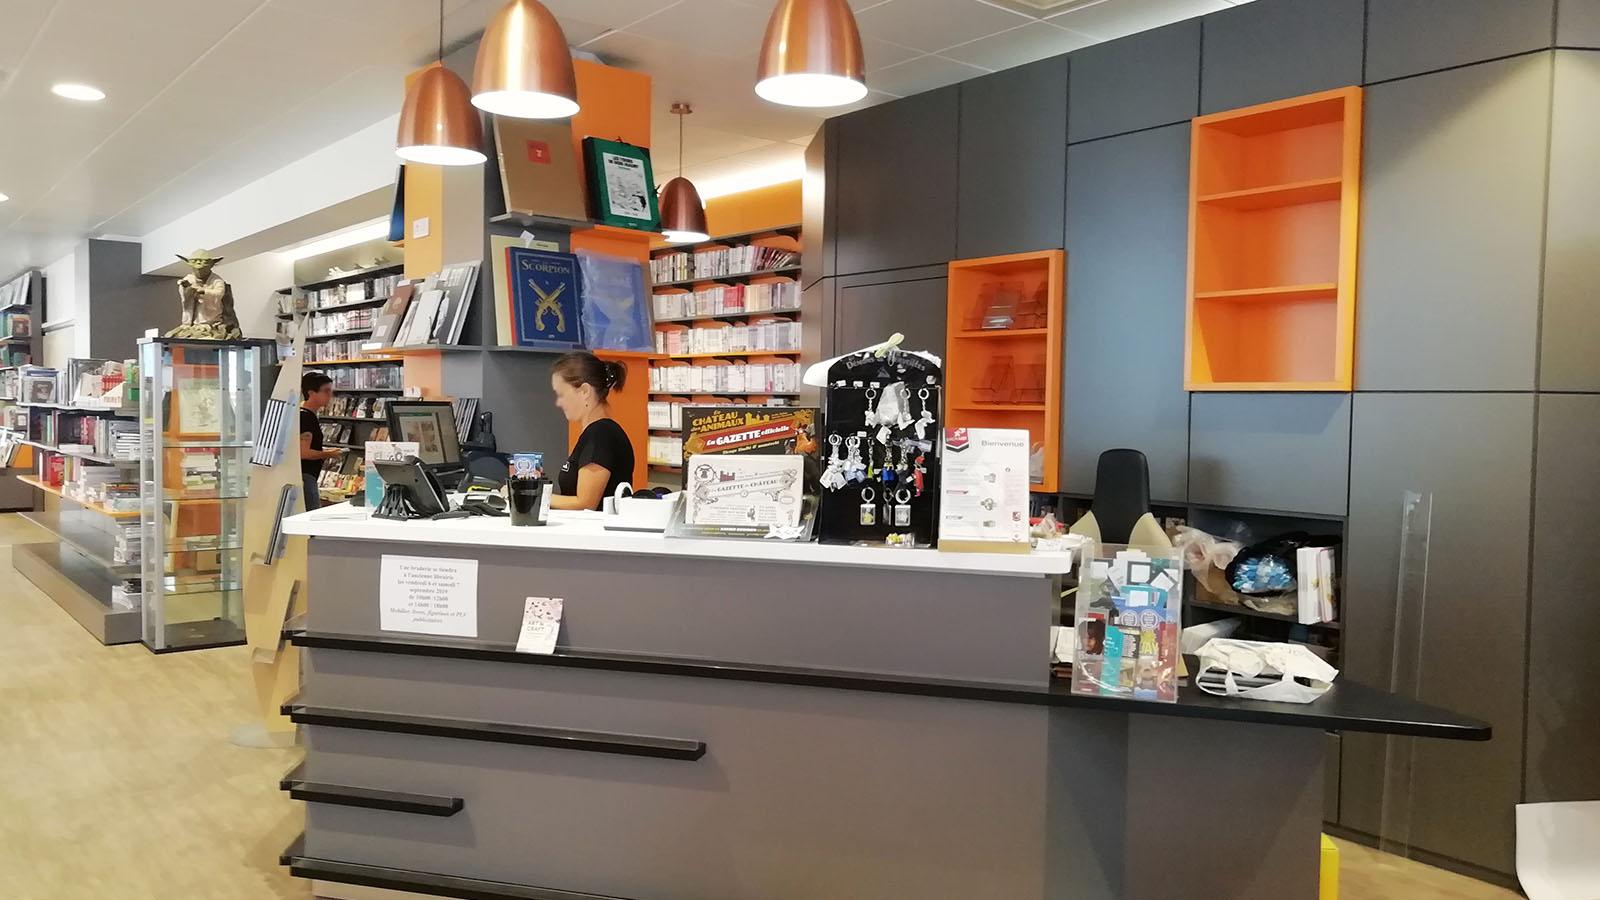 EFI Design EFI Design Librairie La Roche Sur Yon (48) 1382